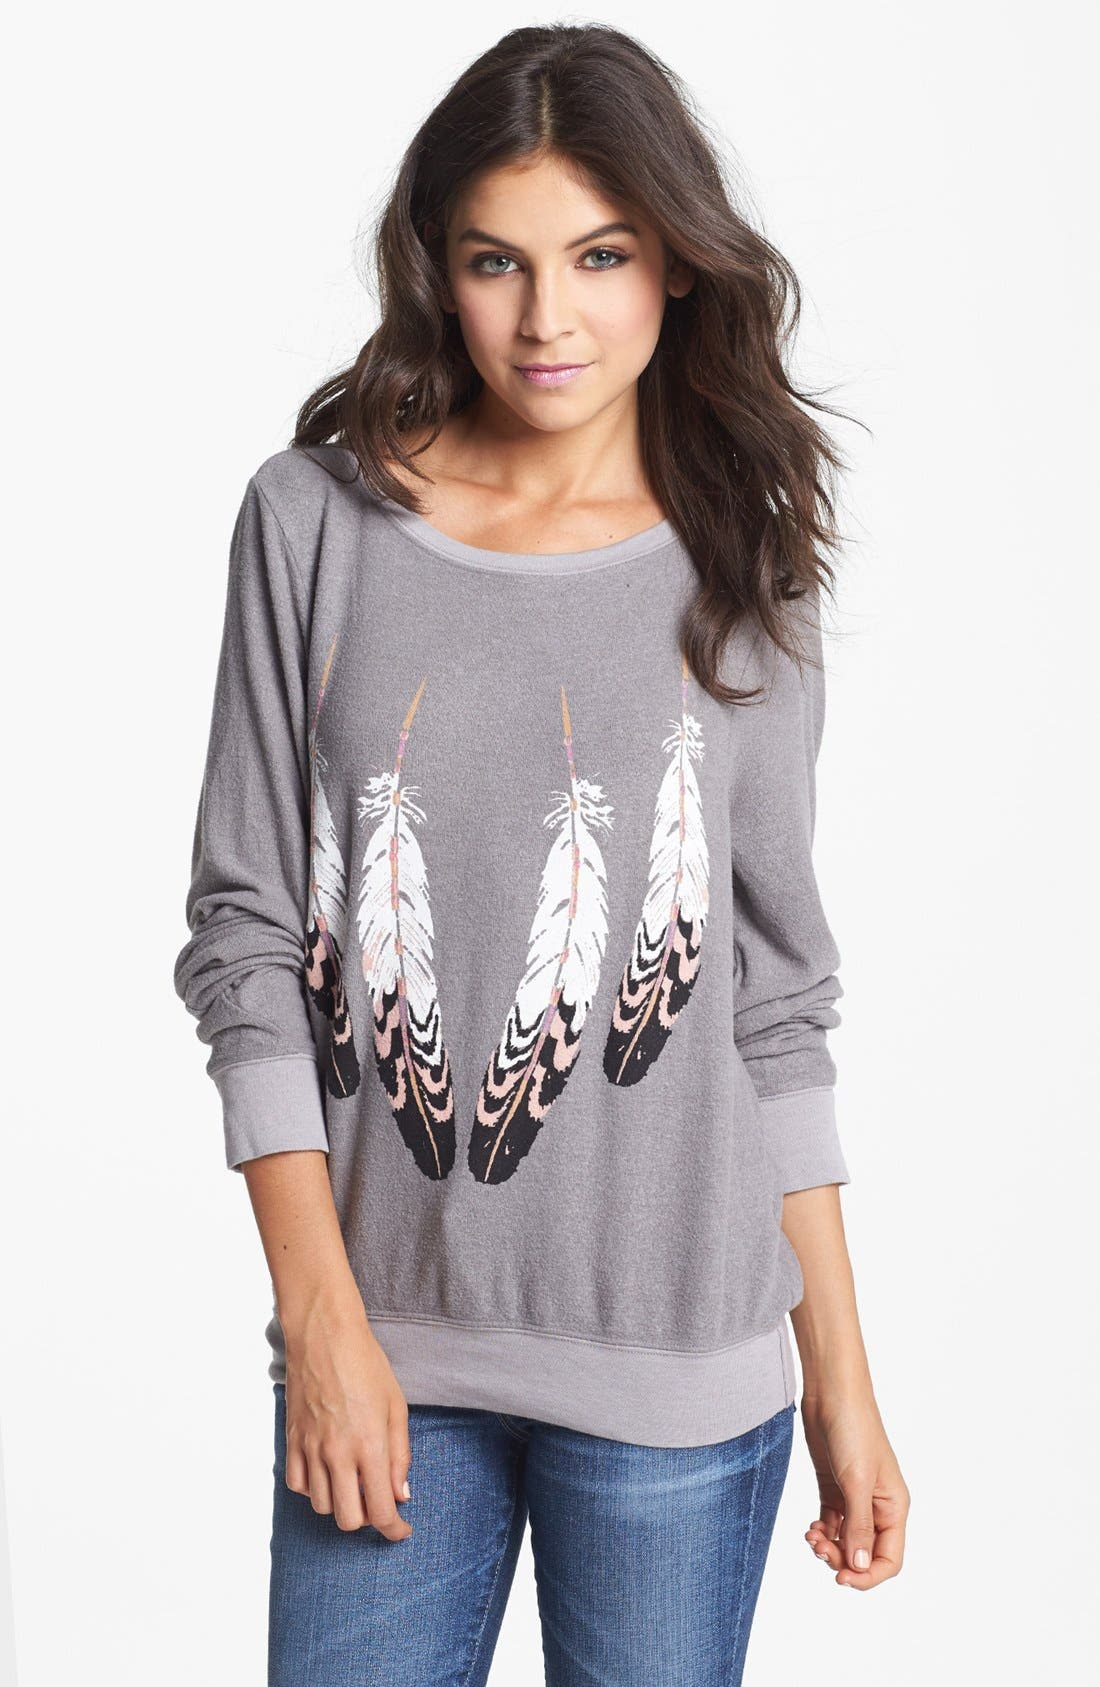 Main Image - Wildfox 'Topanga Canyon' Sweatshirt